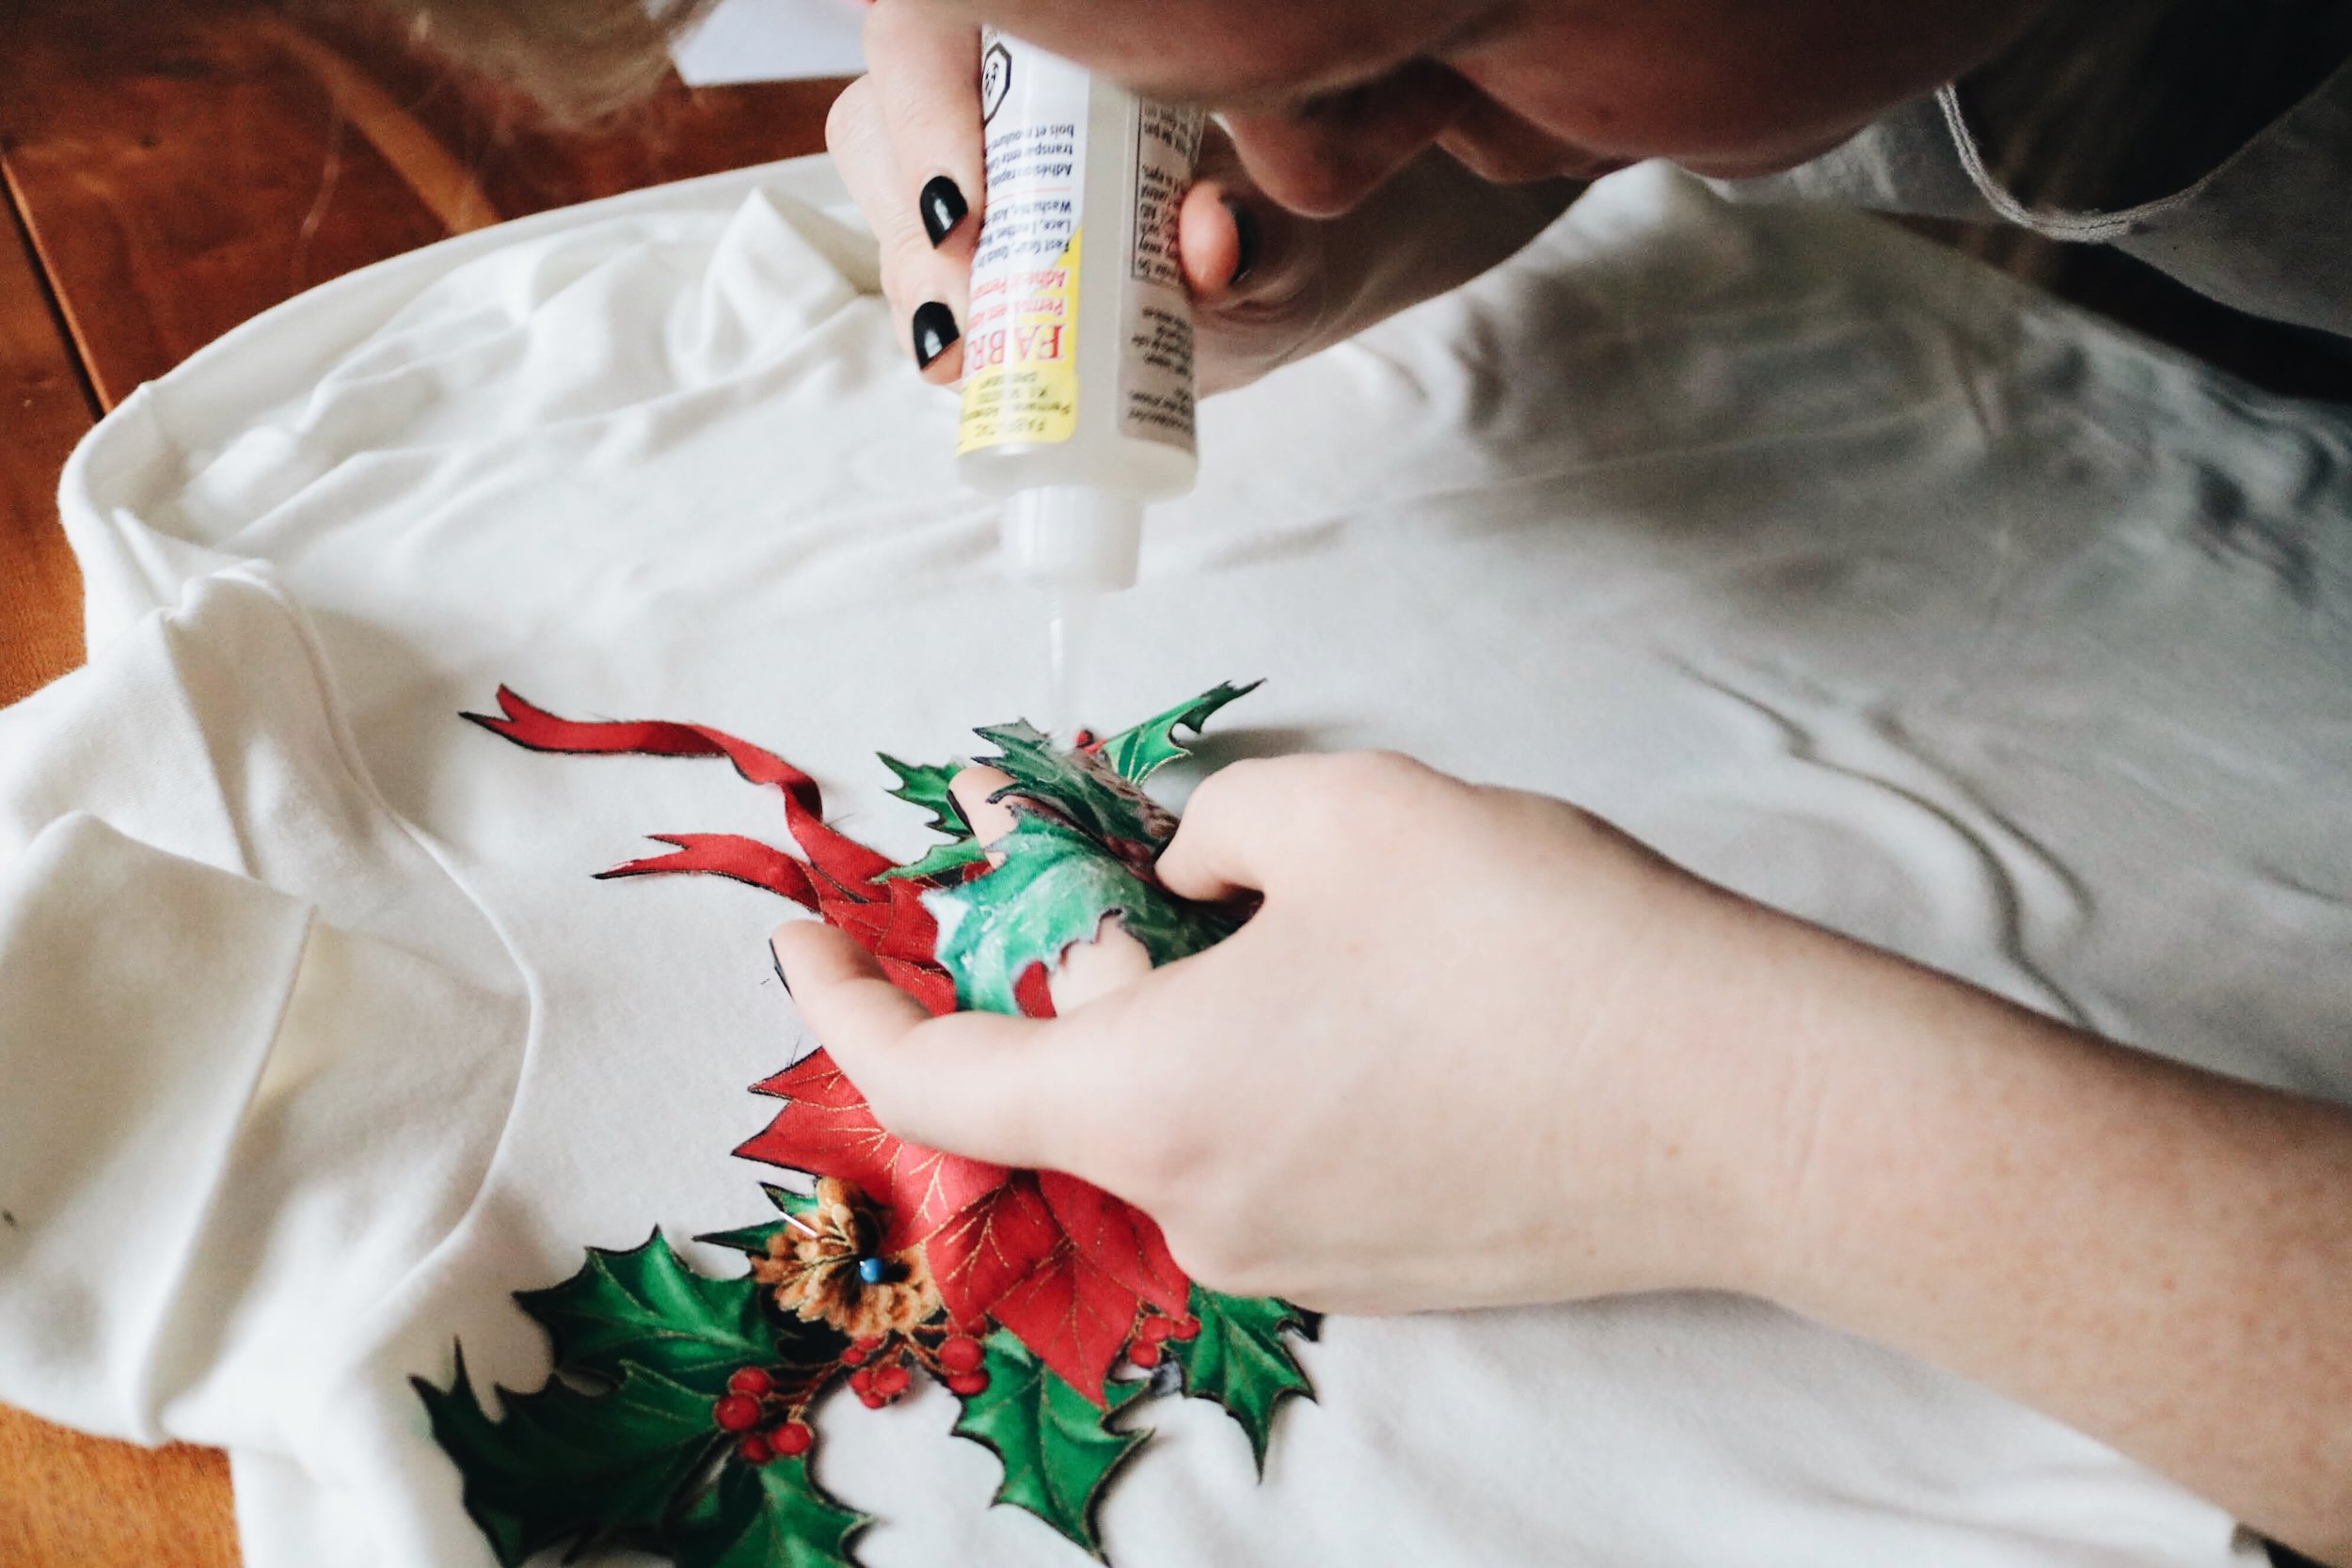 Fabric gluing on Christmas fabric Appliqué for ugly Christmas turtleneck